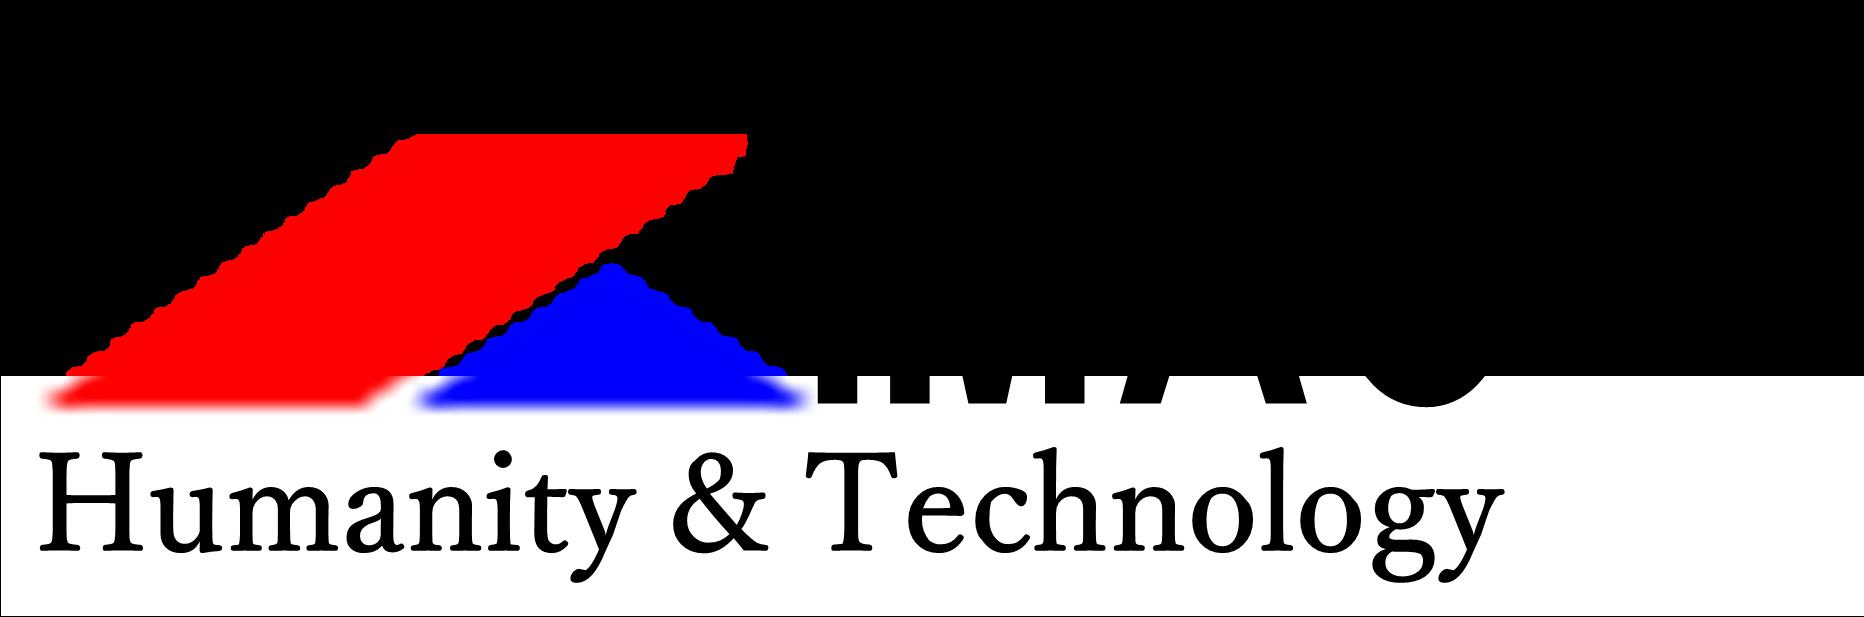 IMAC ENGINEERING Co.Ltd